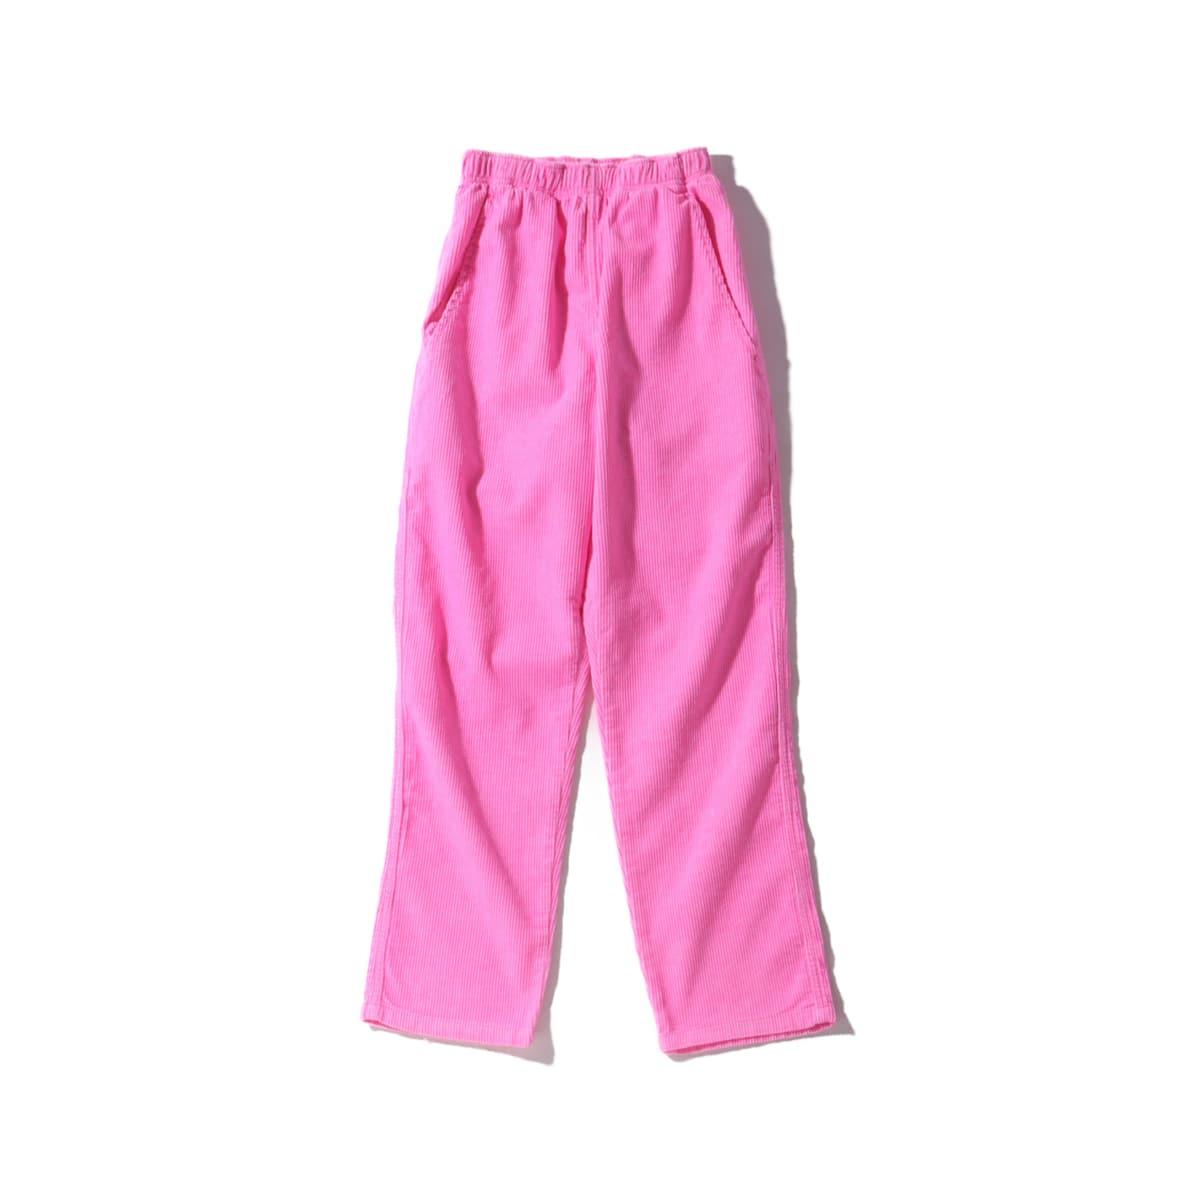 atmos pink コーデュロイ カラーパンツ TX PINK 19HO-I_photo_large